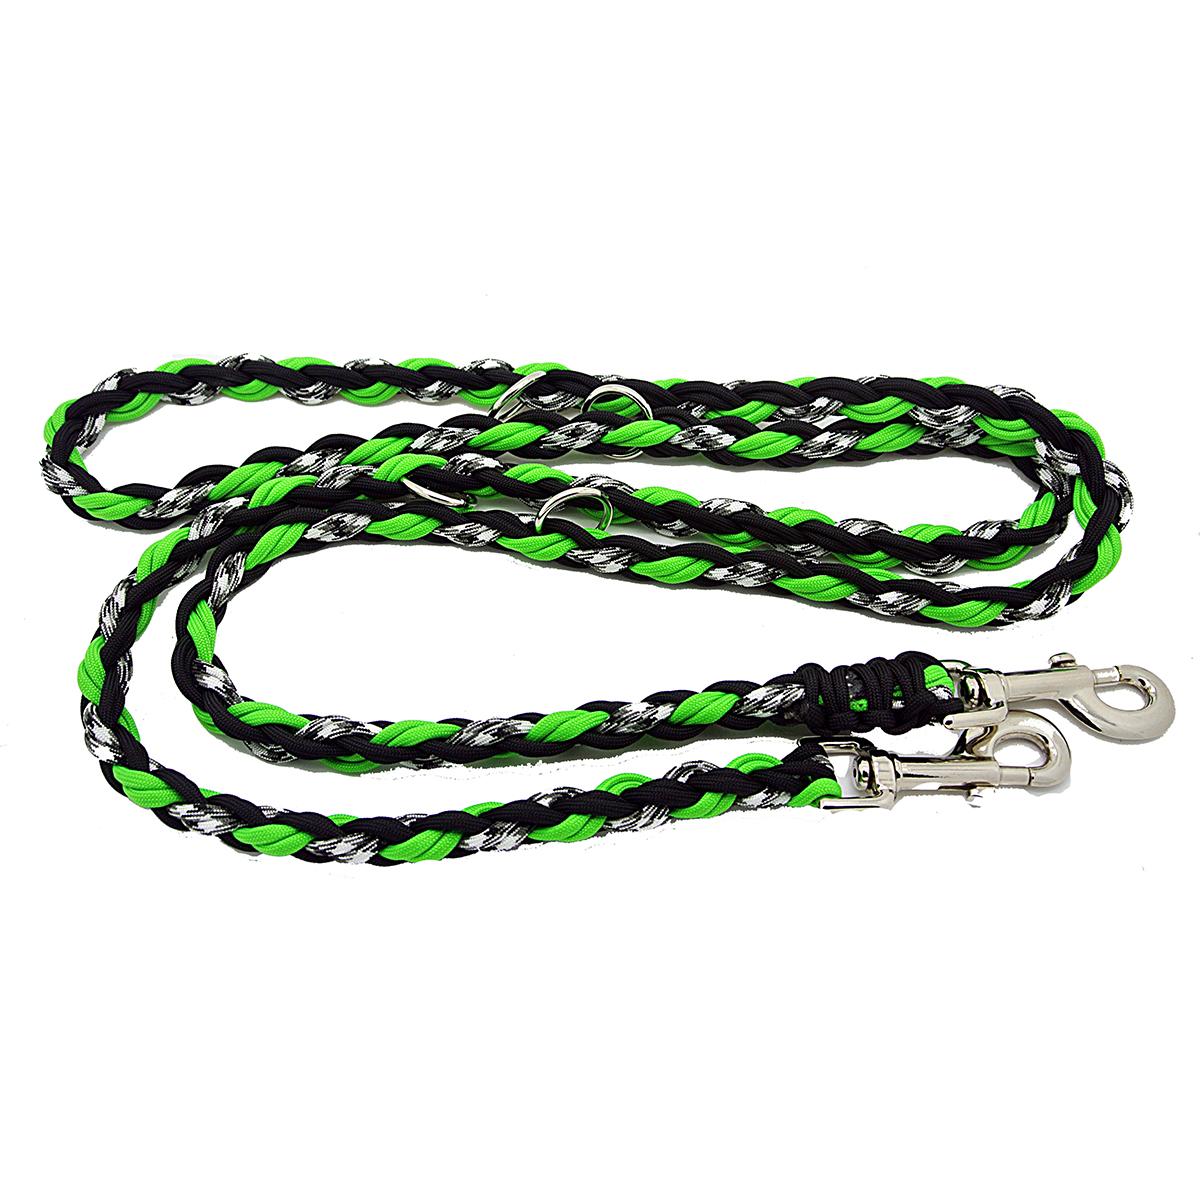 Ghost Multipurpose Dog Leash - Neon Green